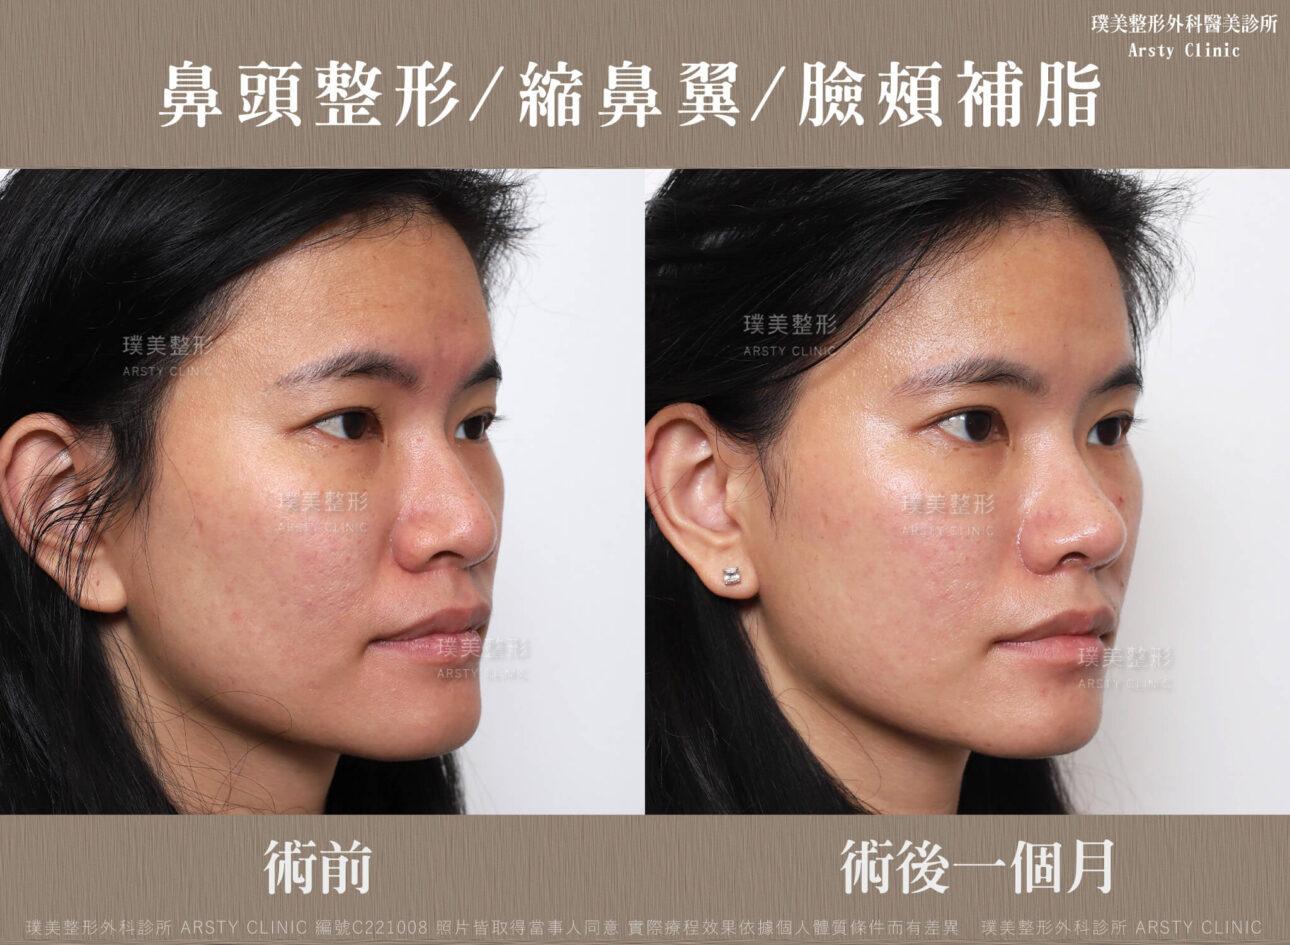 鼻頭整形 縮鼻翼 臉頰補脂 C221008BA1M04